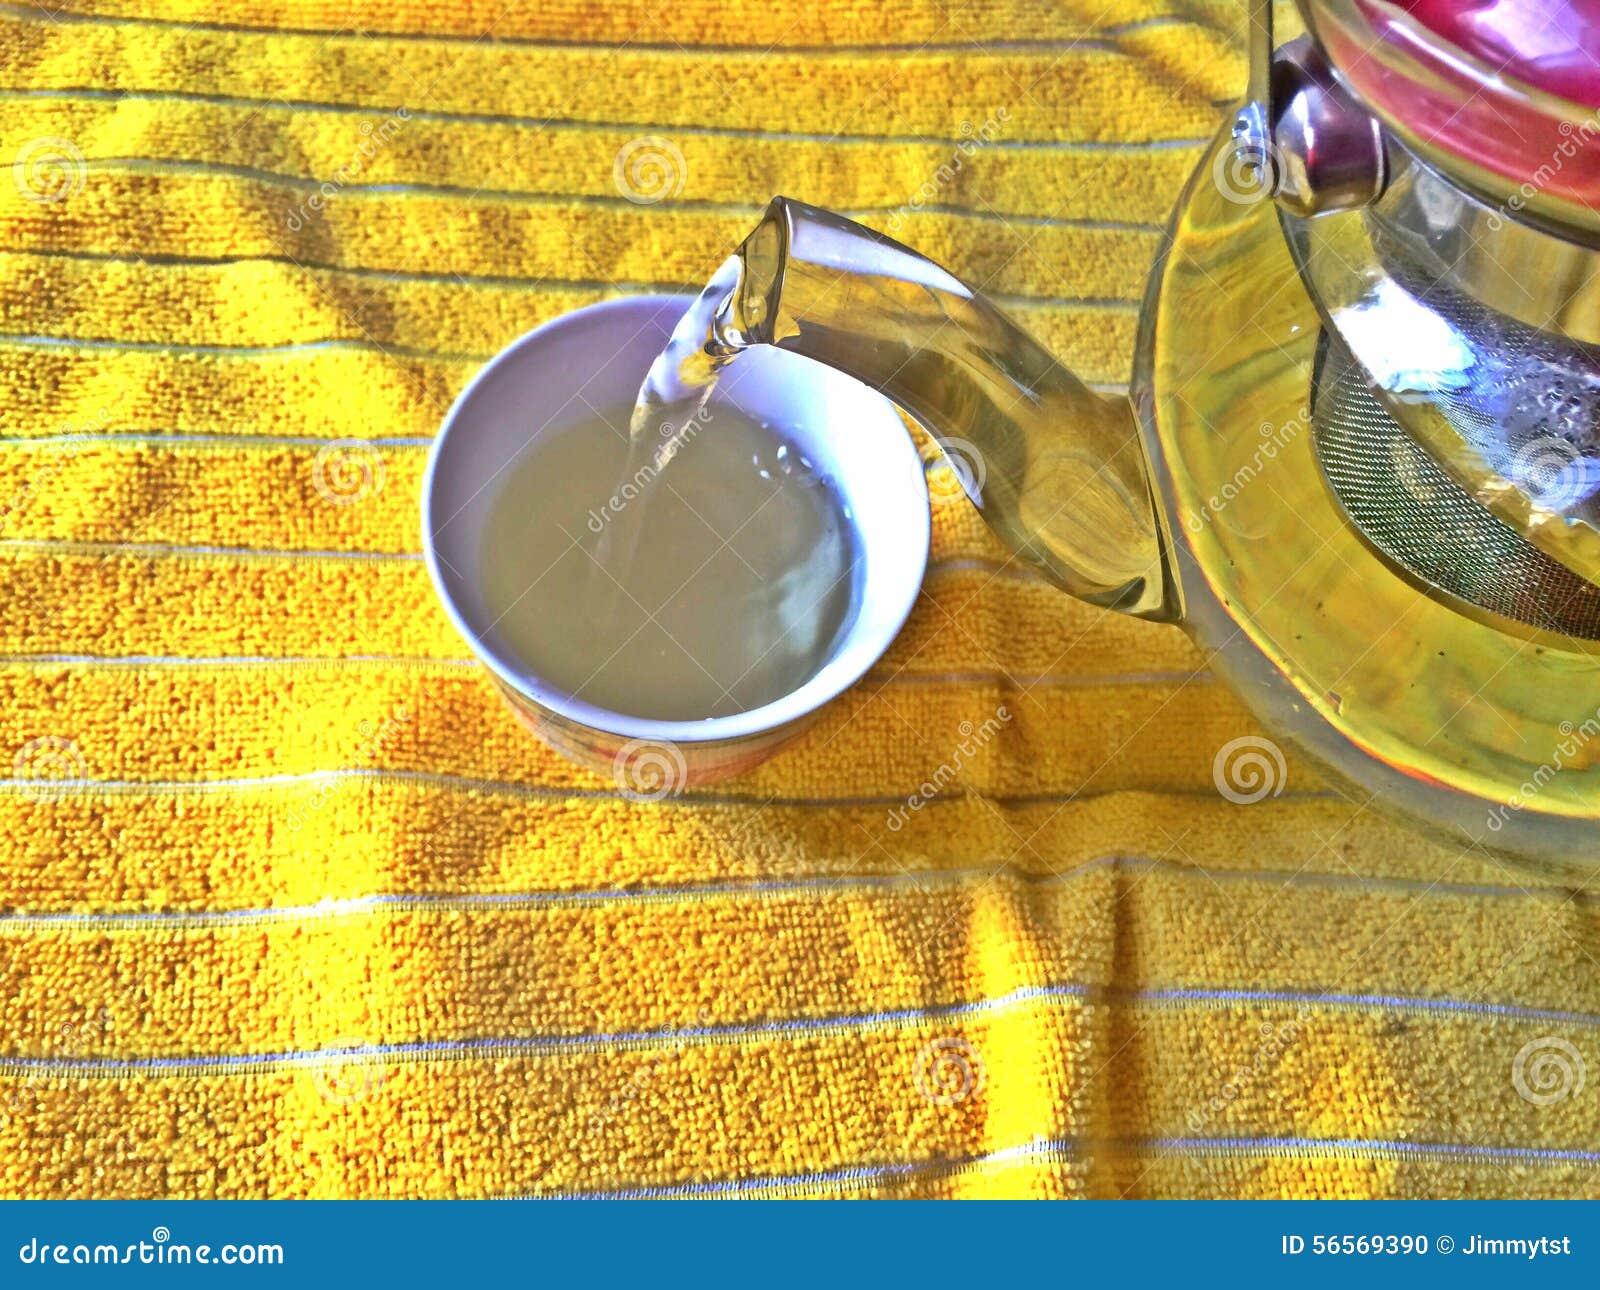 Download χύνοντας τσάι φλυτζανιών στοκ εικόνες. εικόνα από παρασκευάζει - 56569390